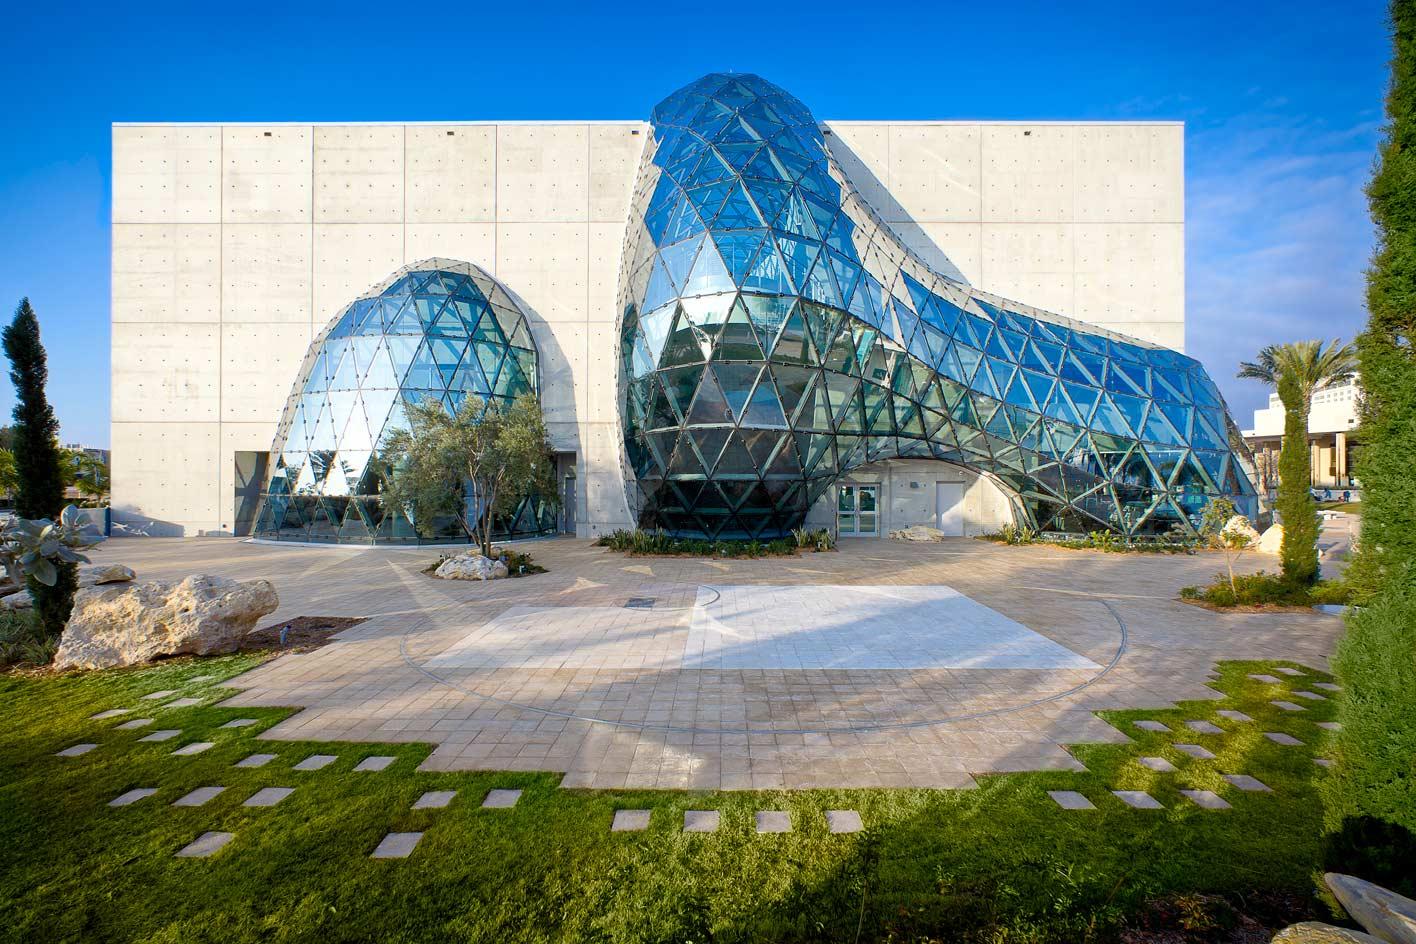 Das neue Salvador Dalí Museum in St. Petersburg Salvador-Dali-Museum_01